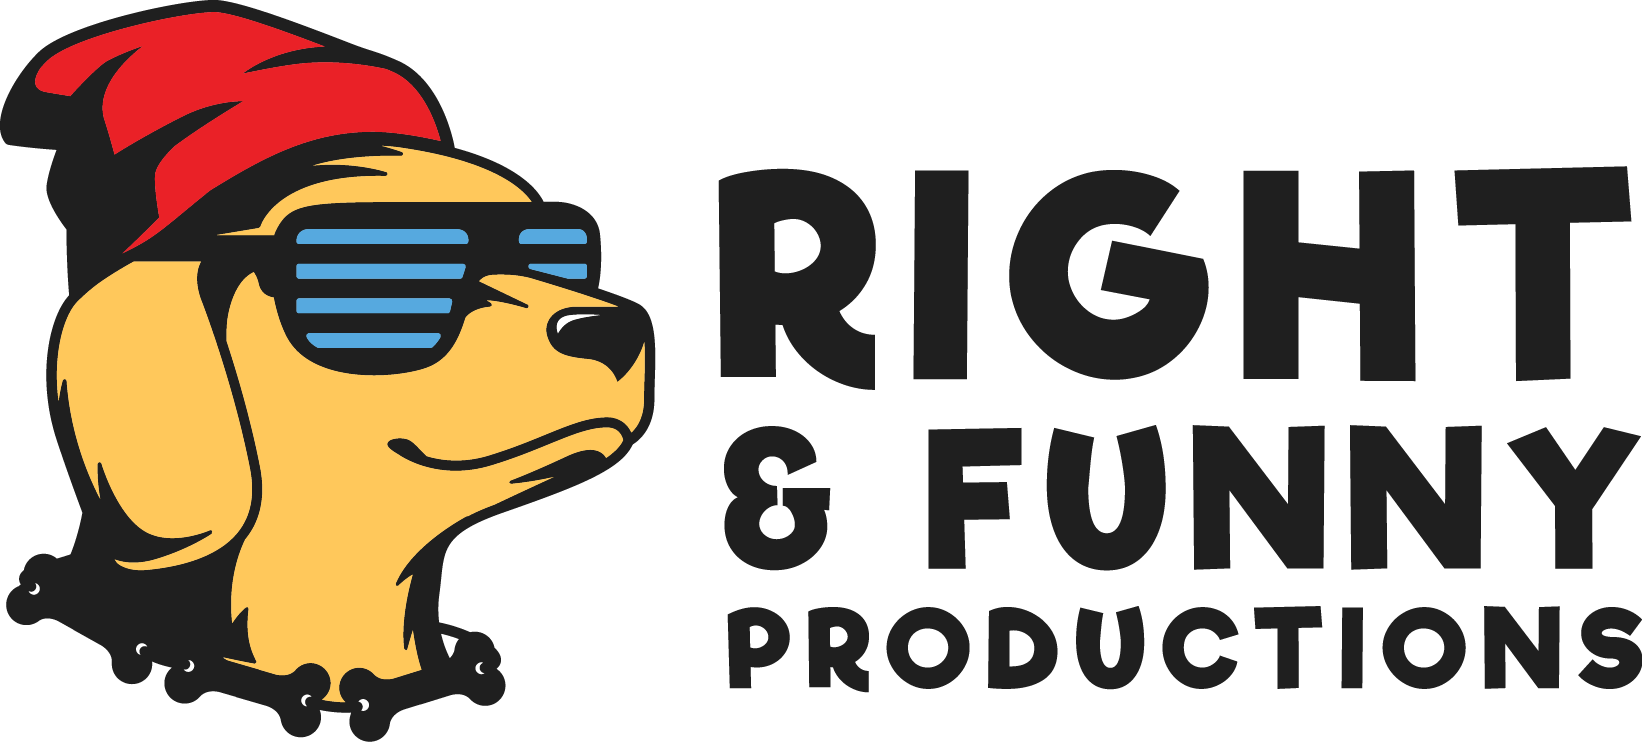 Film & TV Company Needs Iconic Logo